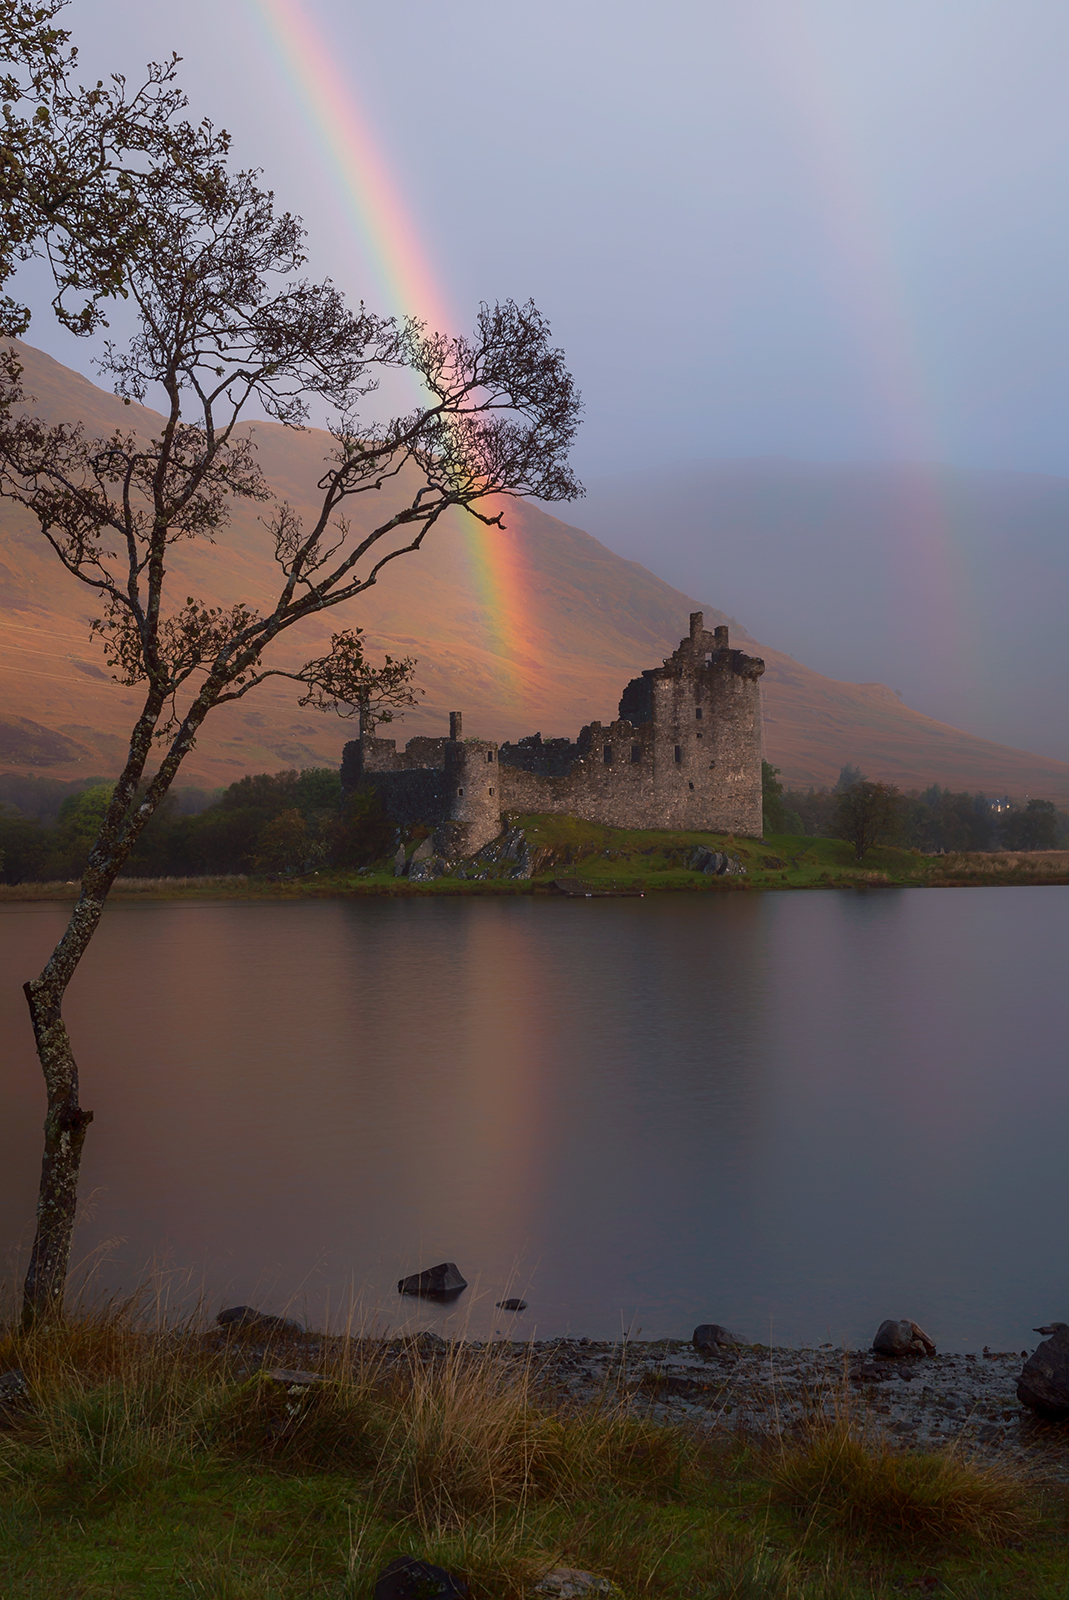 A double rainbow over Kilchurn Castle on the Scotland Photography Workshop